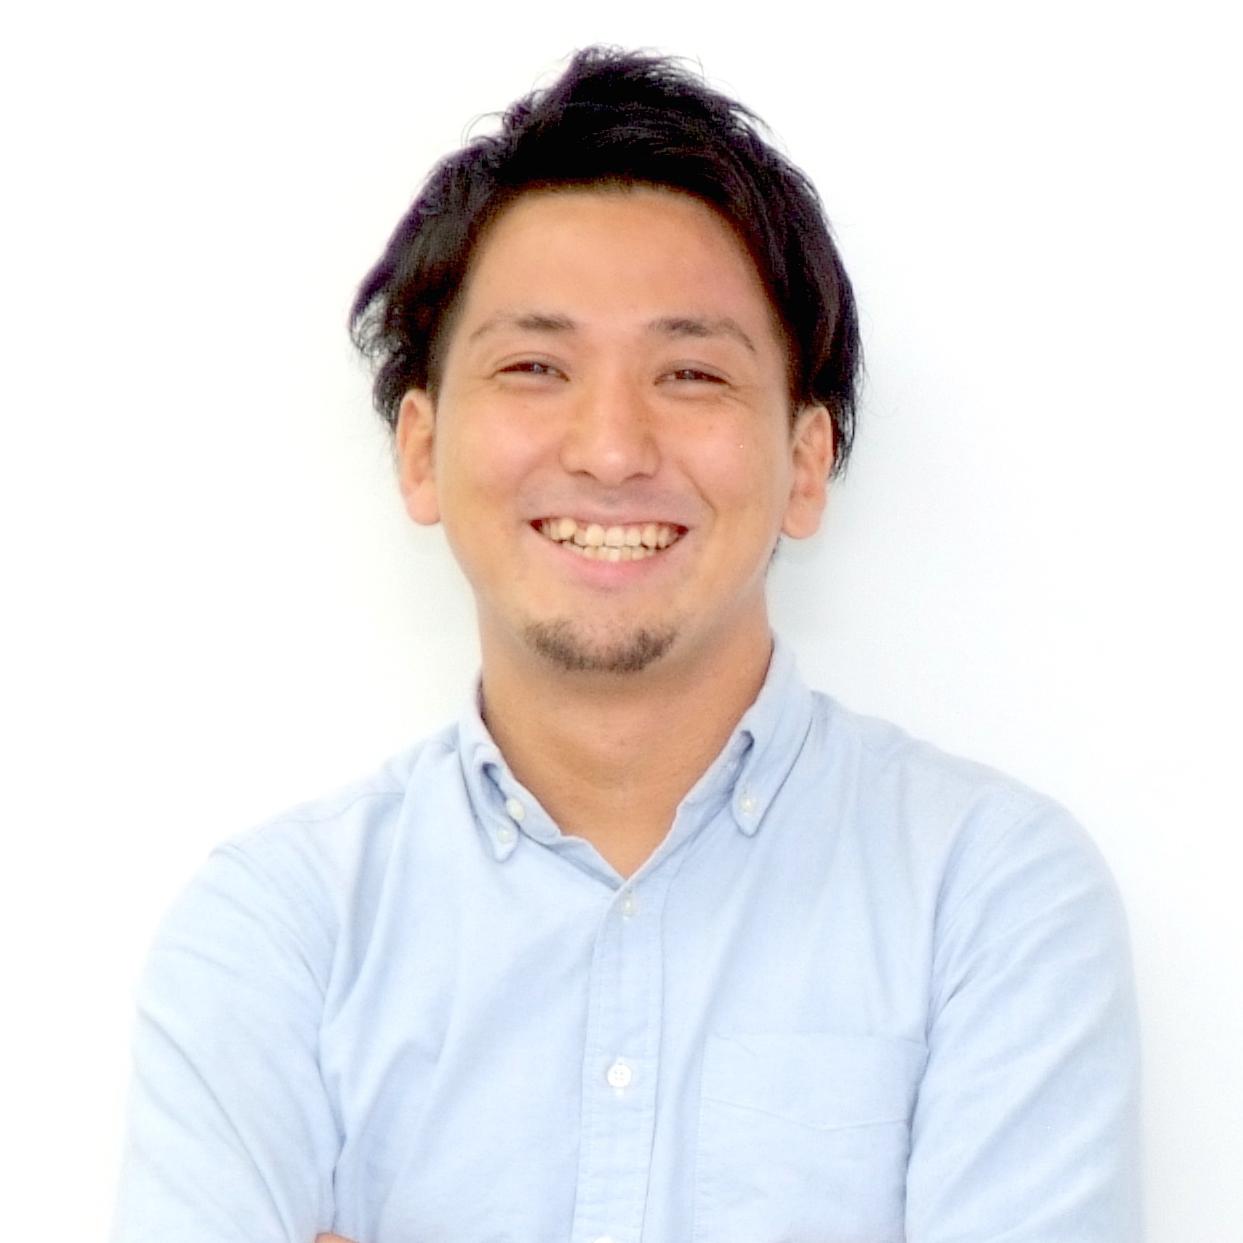 naoyashimizu